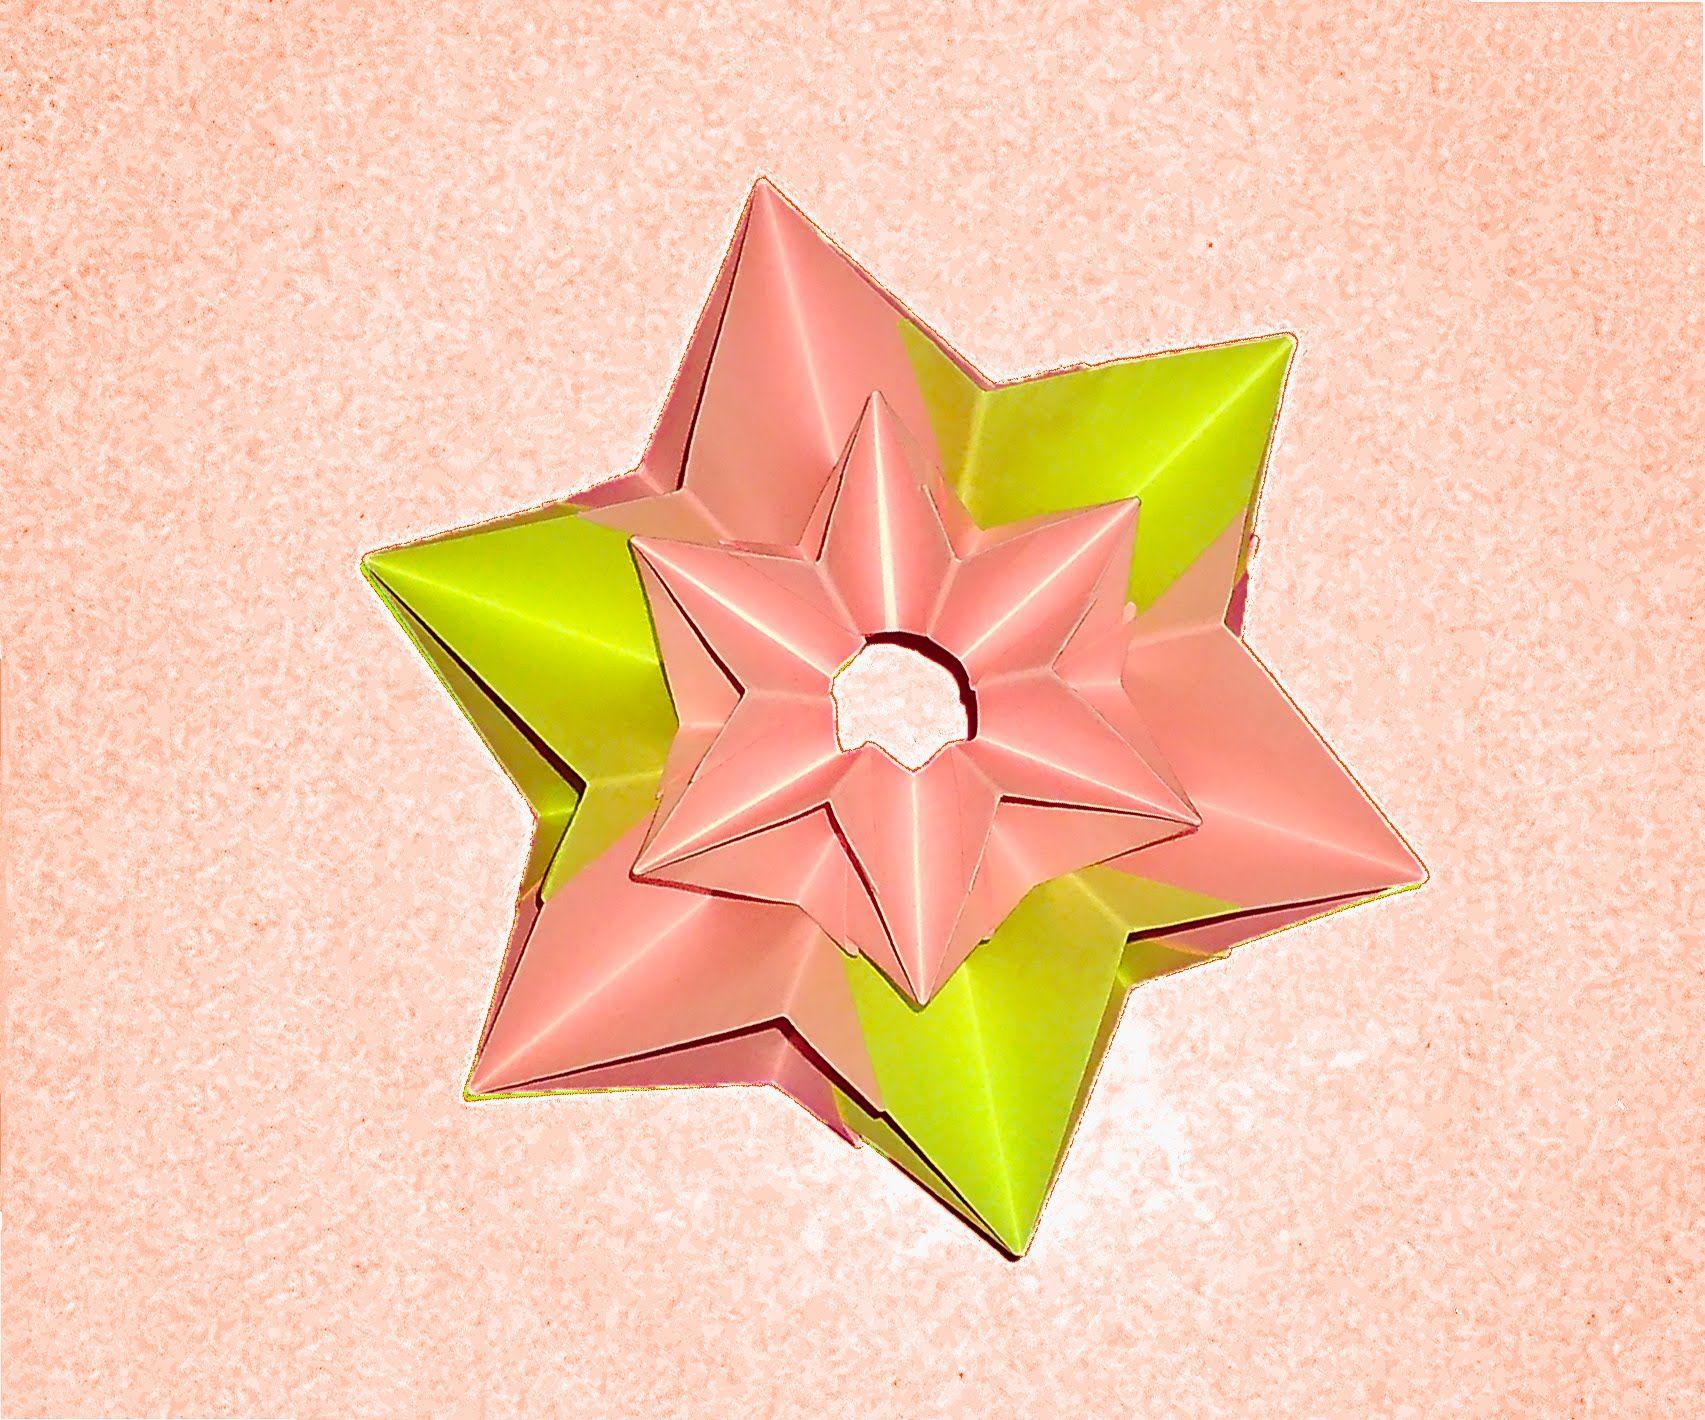 Origami Modular Flower Flor Modular De Papel Origami Paper